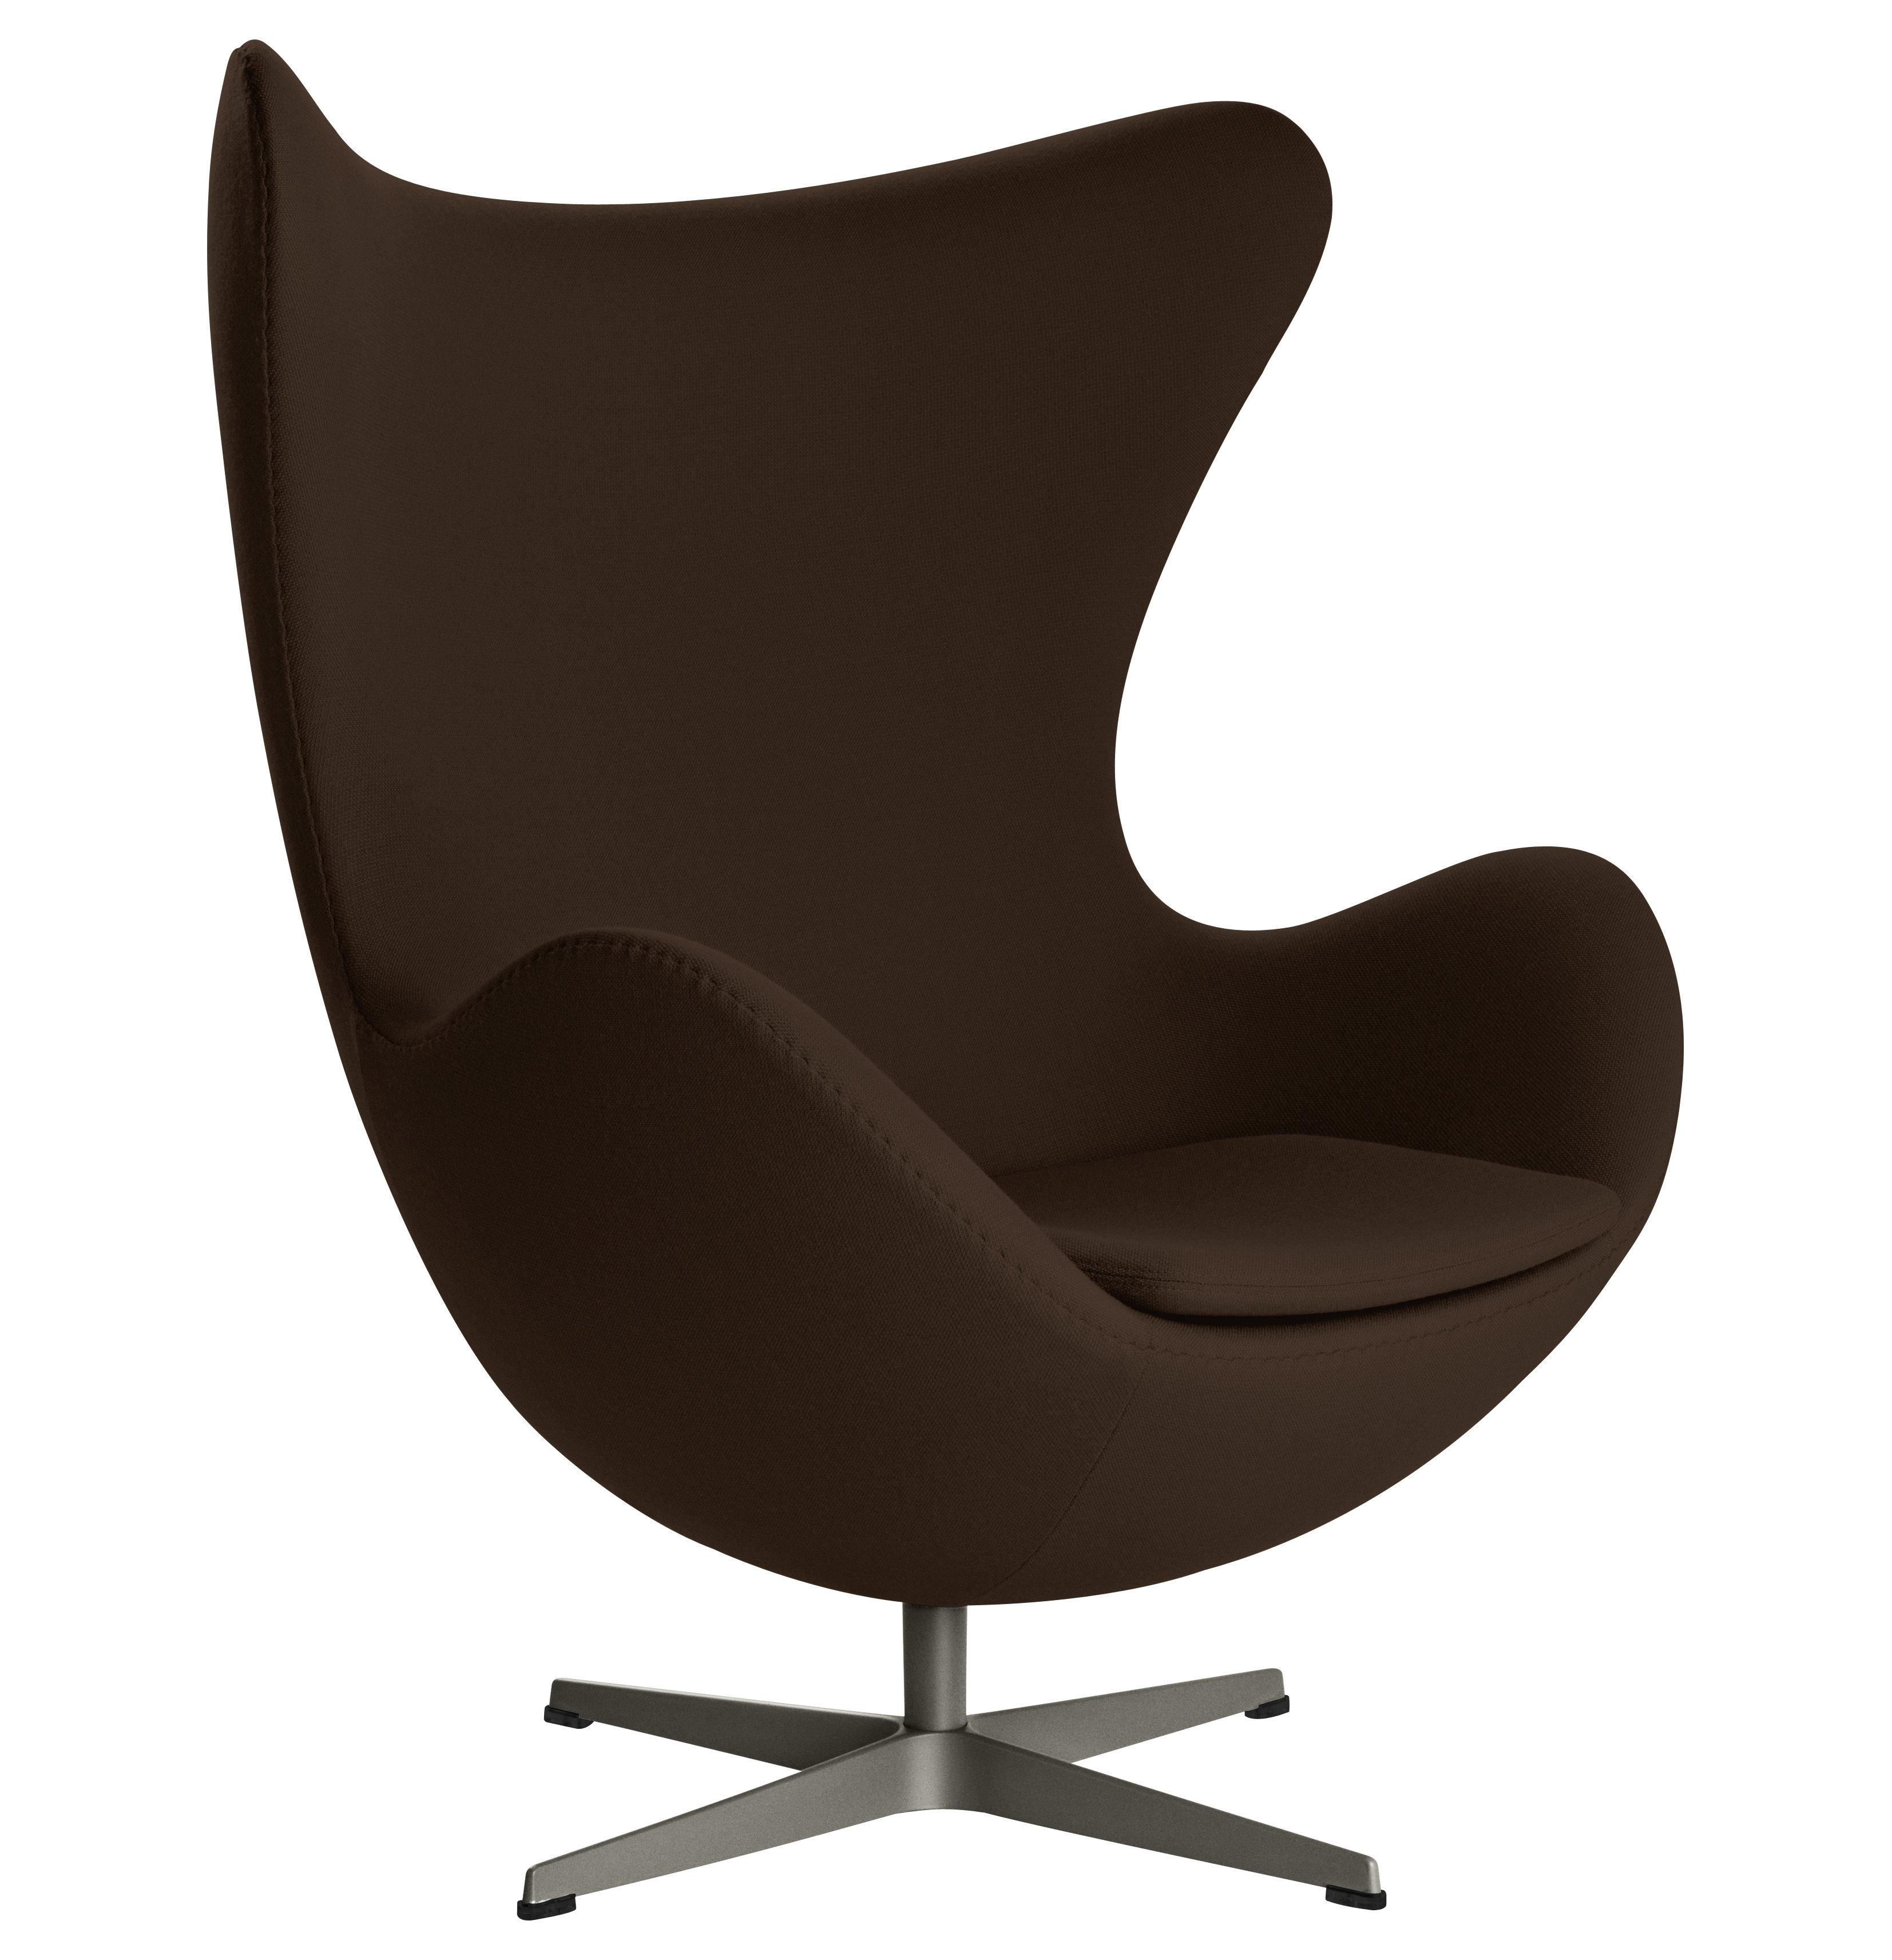 fauteuil pivotant egg chair rembourr tissu gabriele chocolat fritz hansen. Black Bedroom Furniture Sets. Home Design Ideas